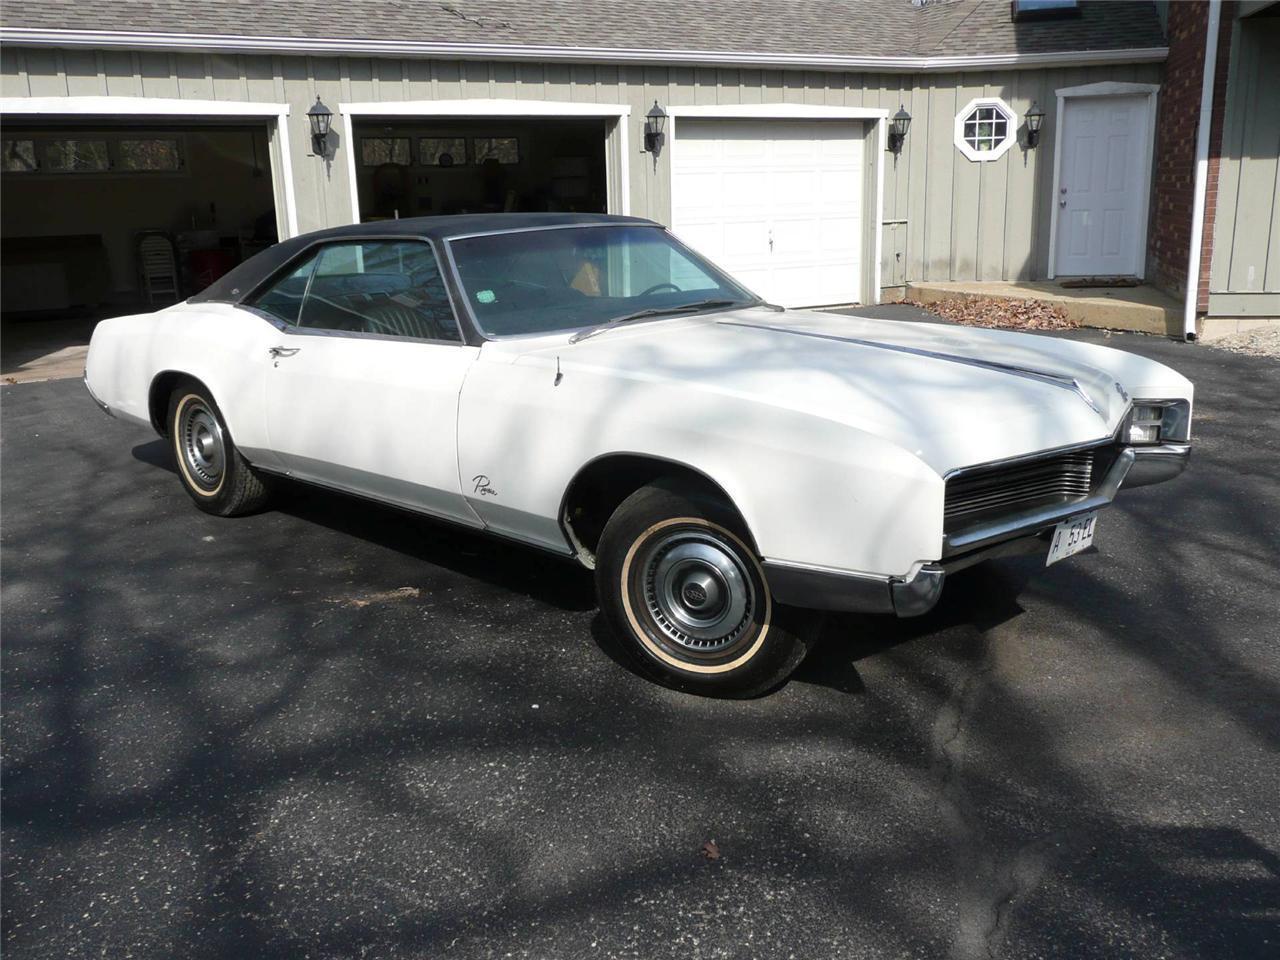 1967 Buick Riviera For Sale On Craigslist – automobilindustrie